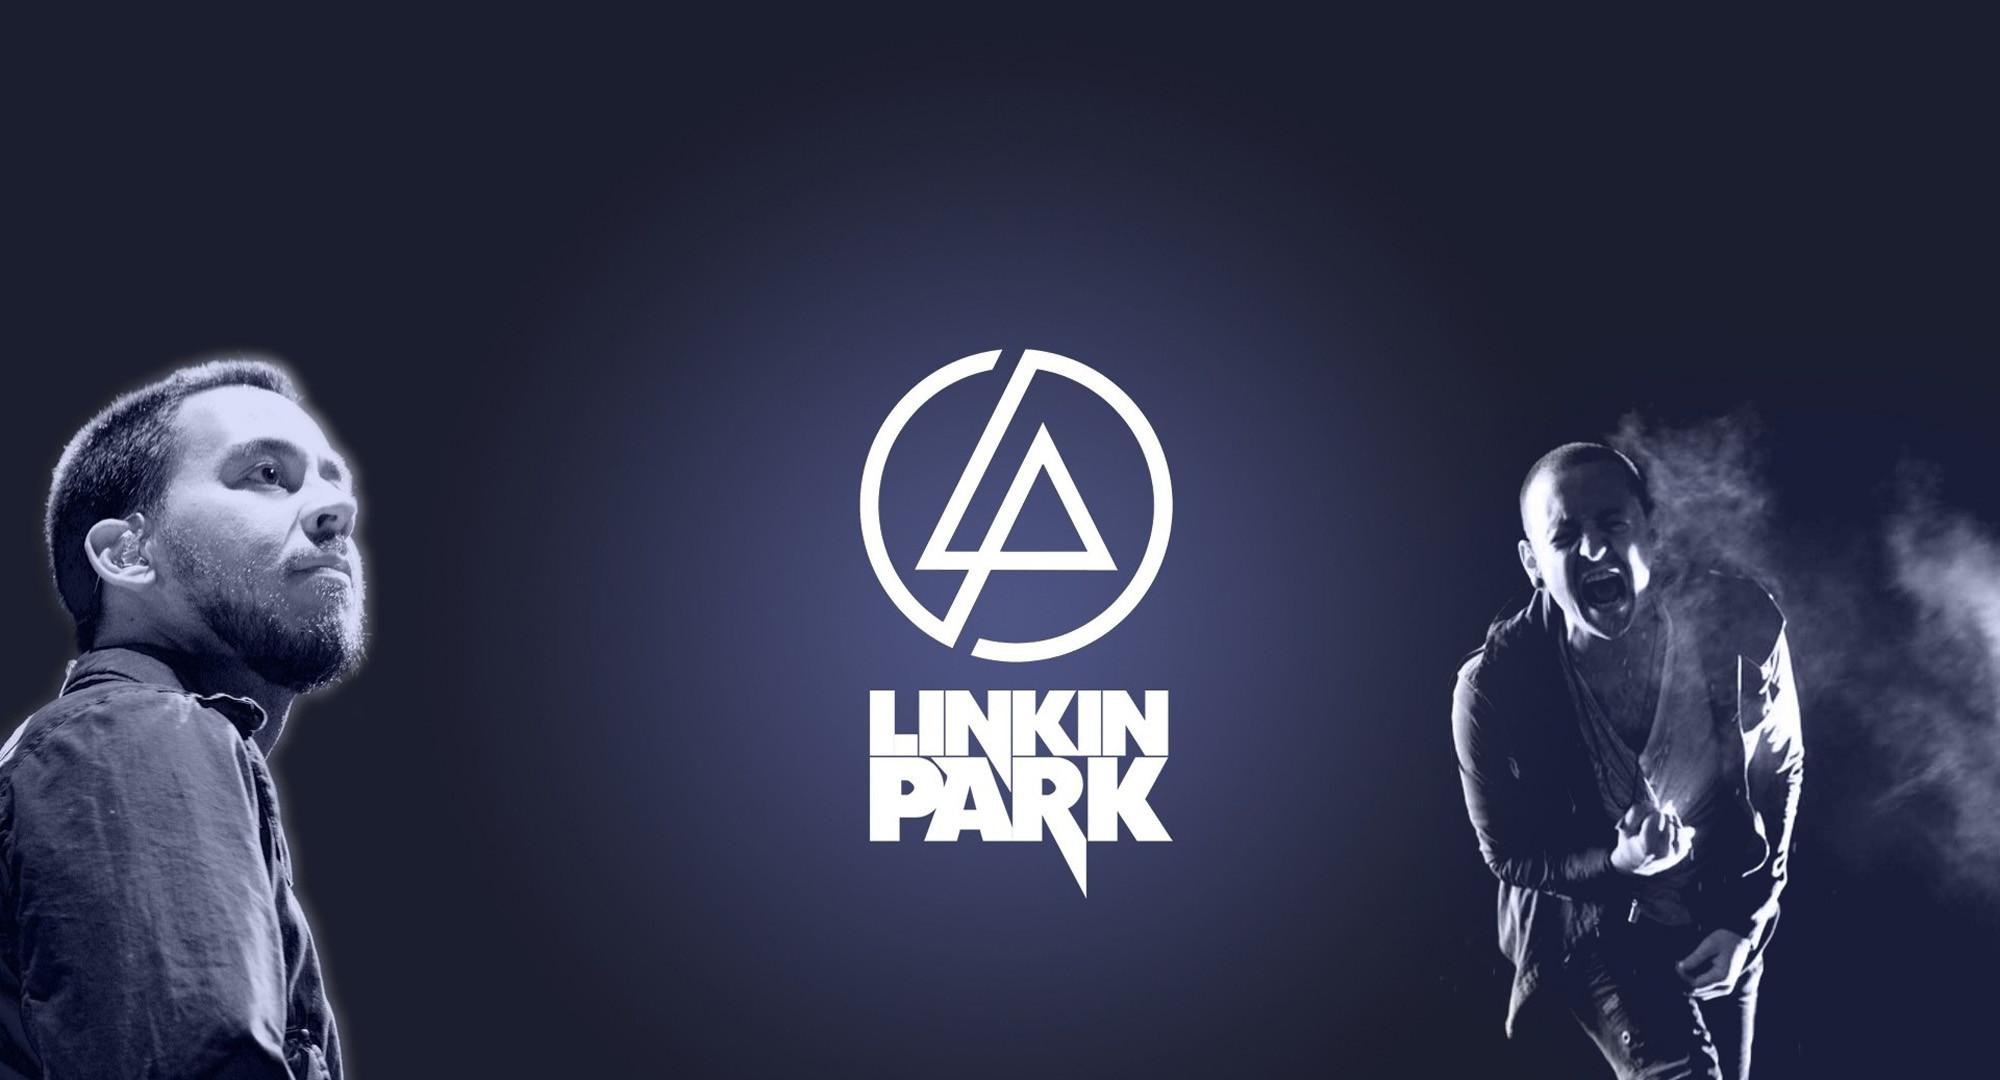 1920x1080 Linkin Park Logo Wallpaper HD